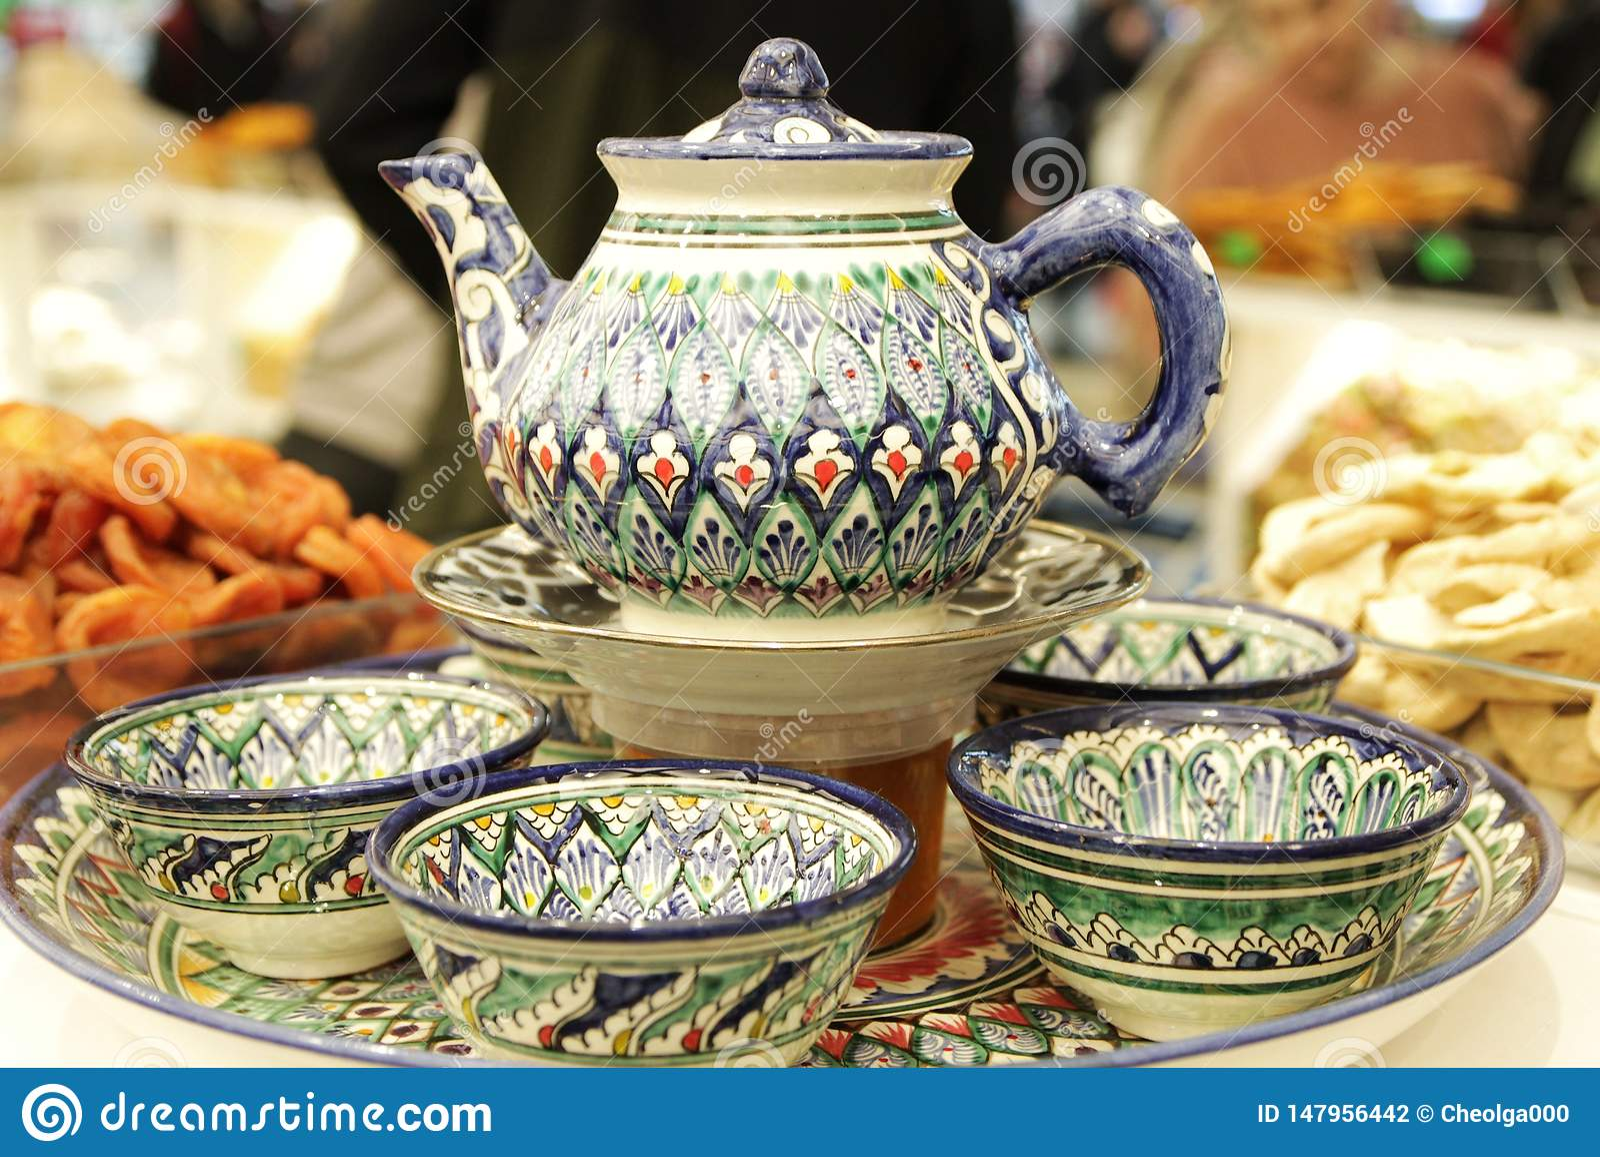 Theestel, theepot, koppen, geschilderde Turkse keramiek, snoepjes en droge vruchten